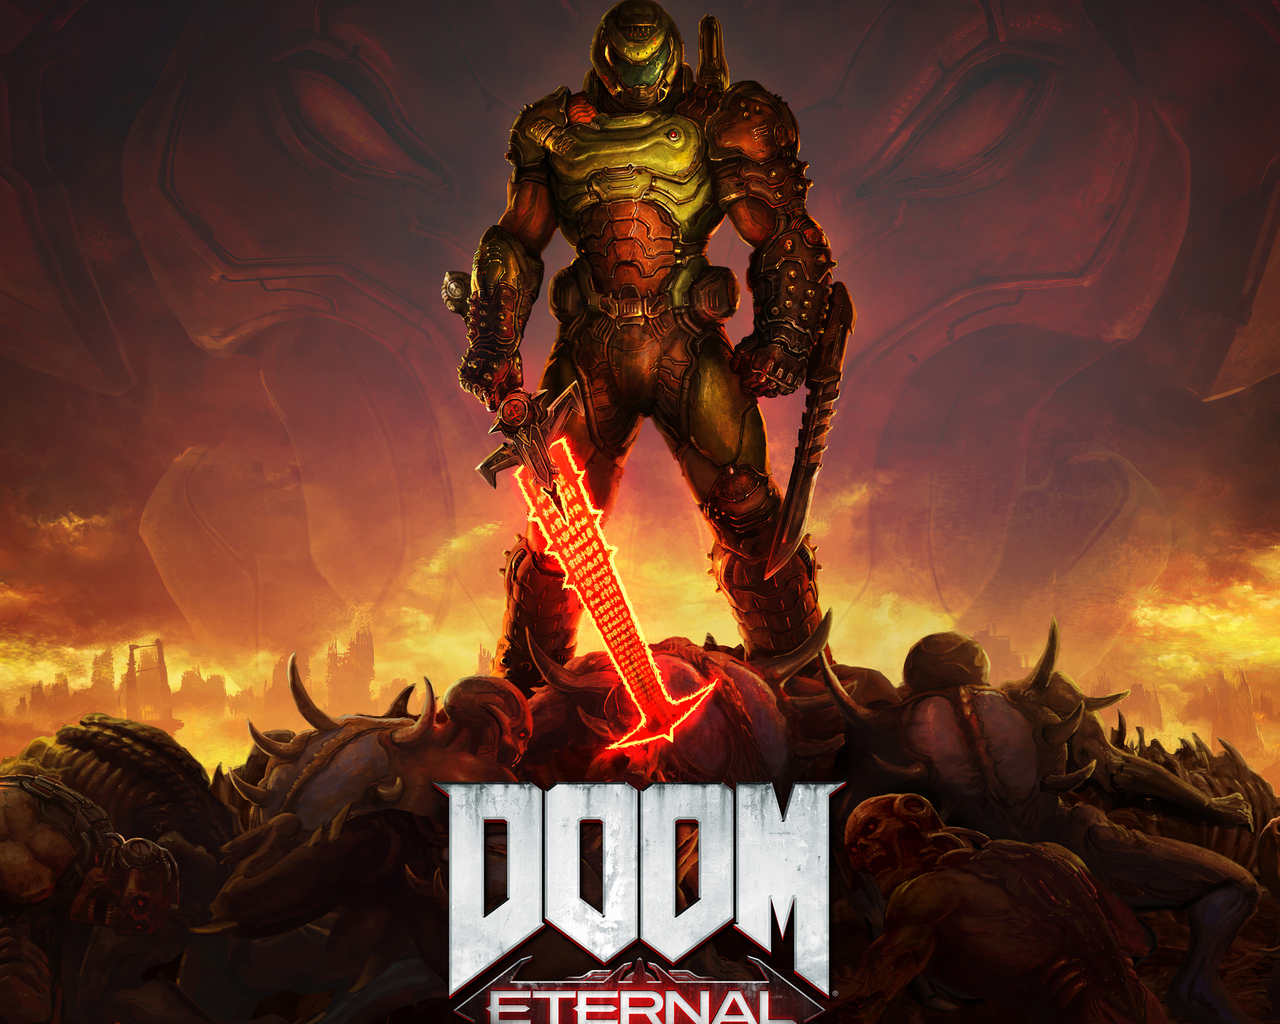 doom-eternal-4k-2020-75.jpg